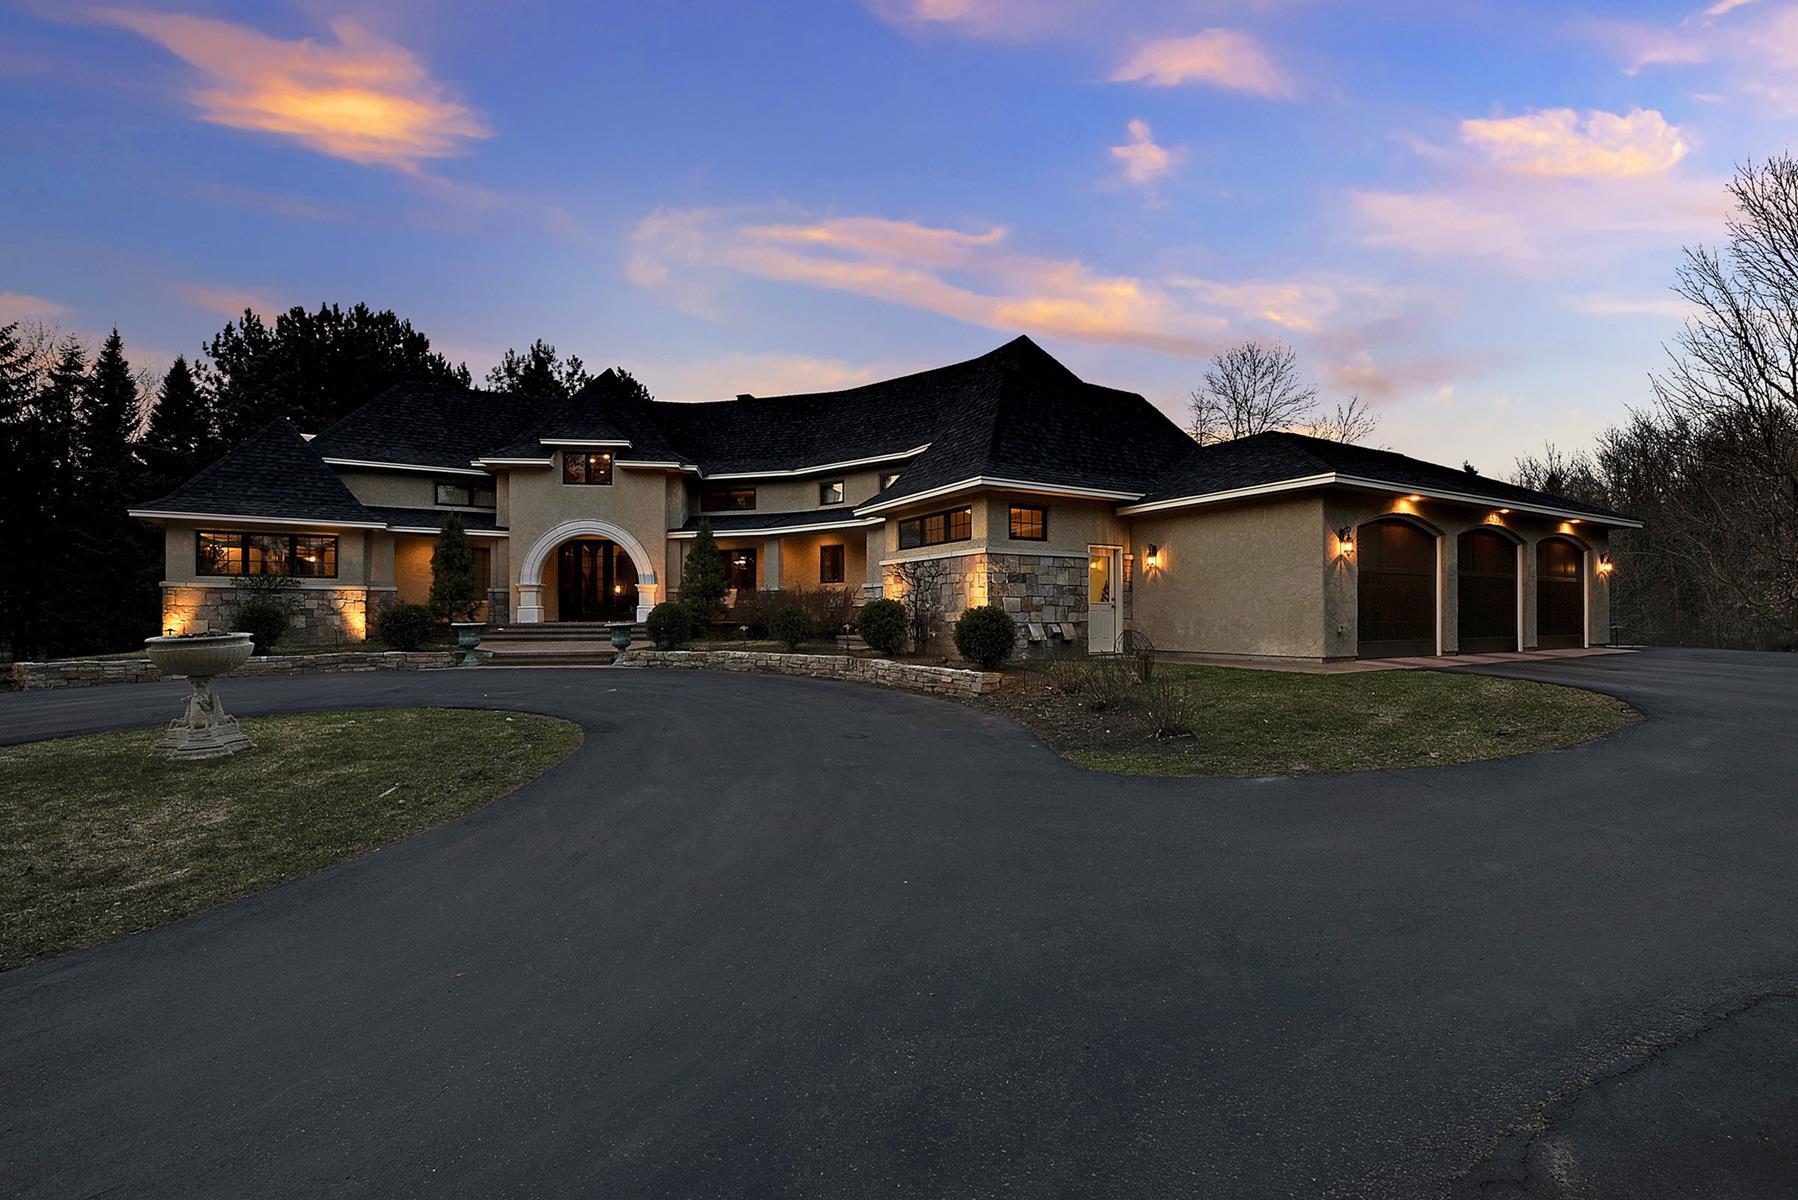 Single Family Home for Sale at 2530 Fox Street Orono, Minnesota, 55391 United States